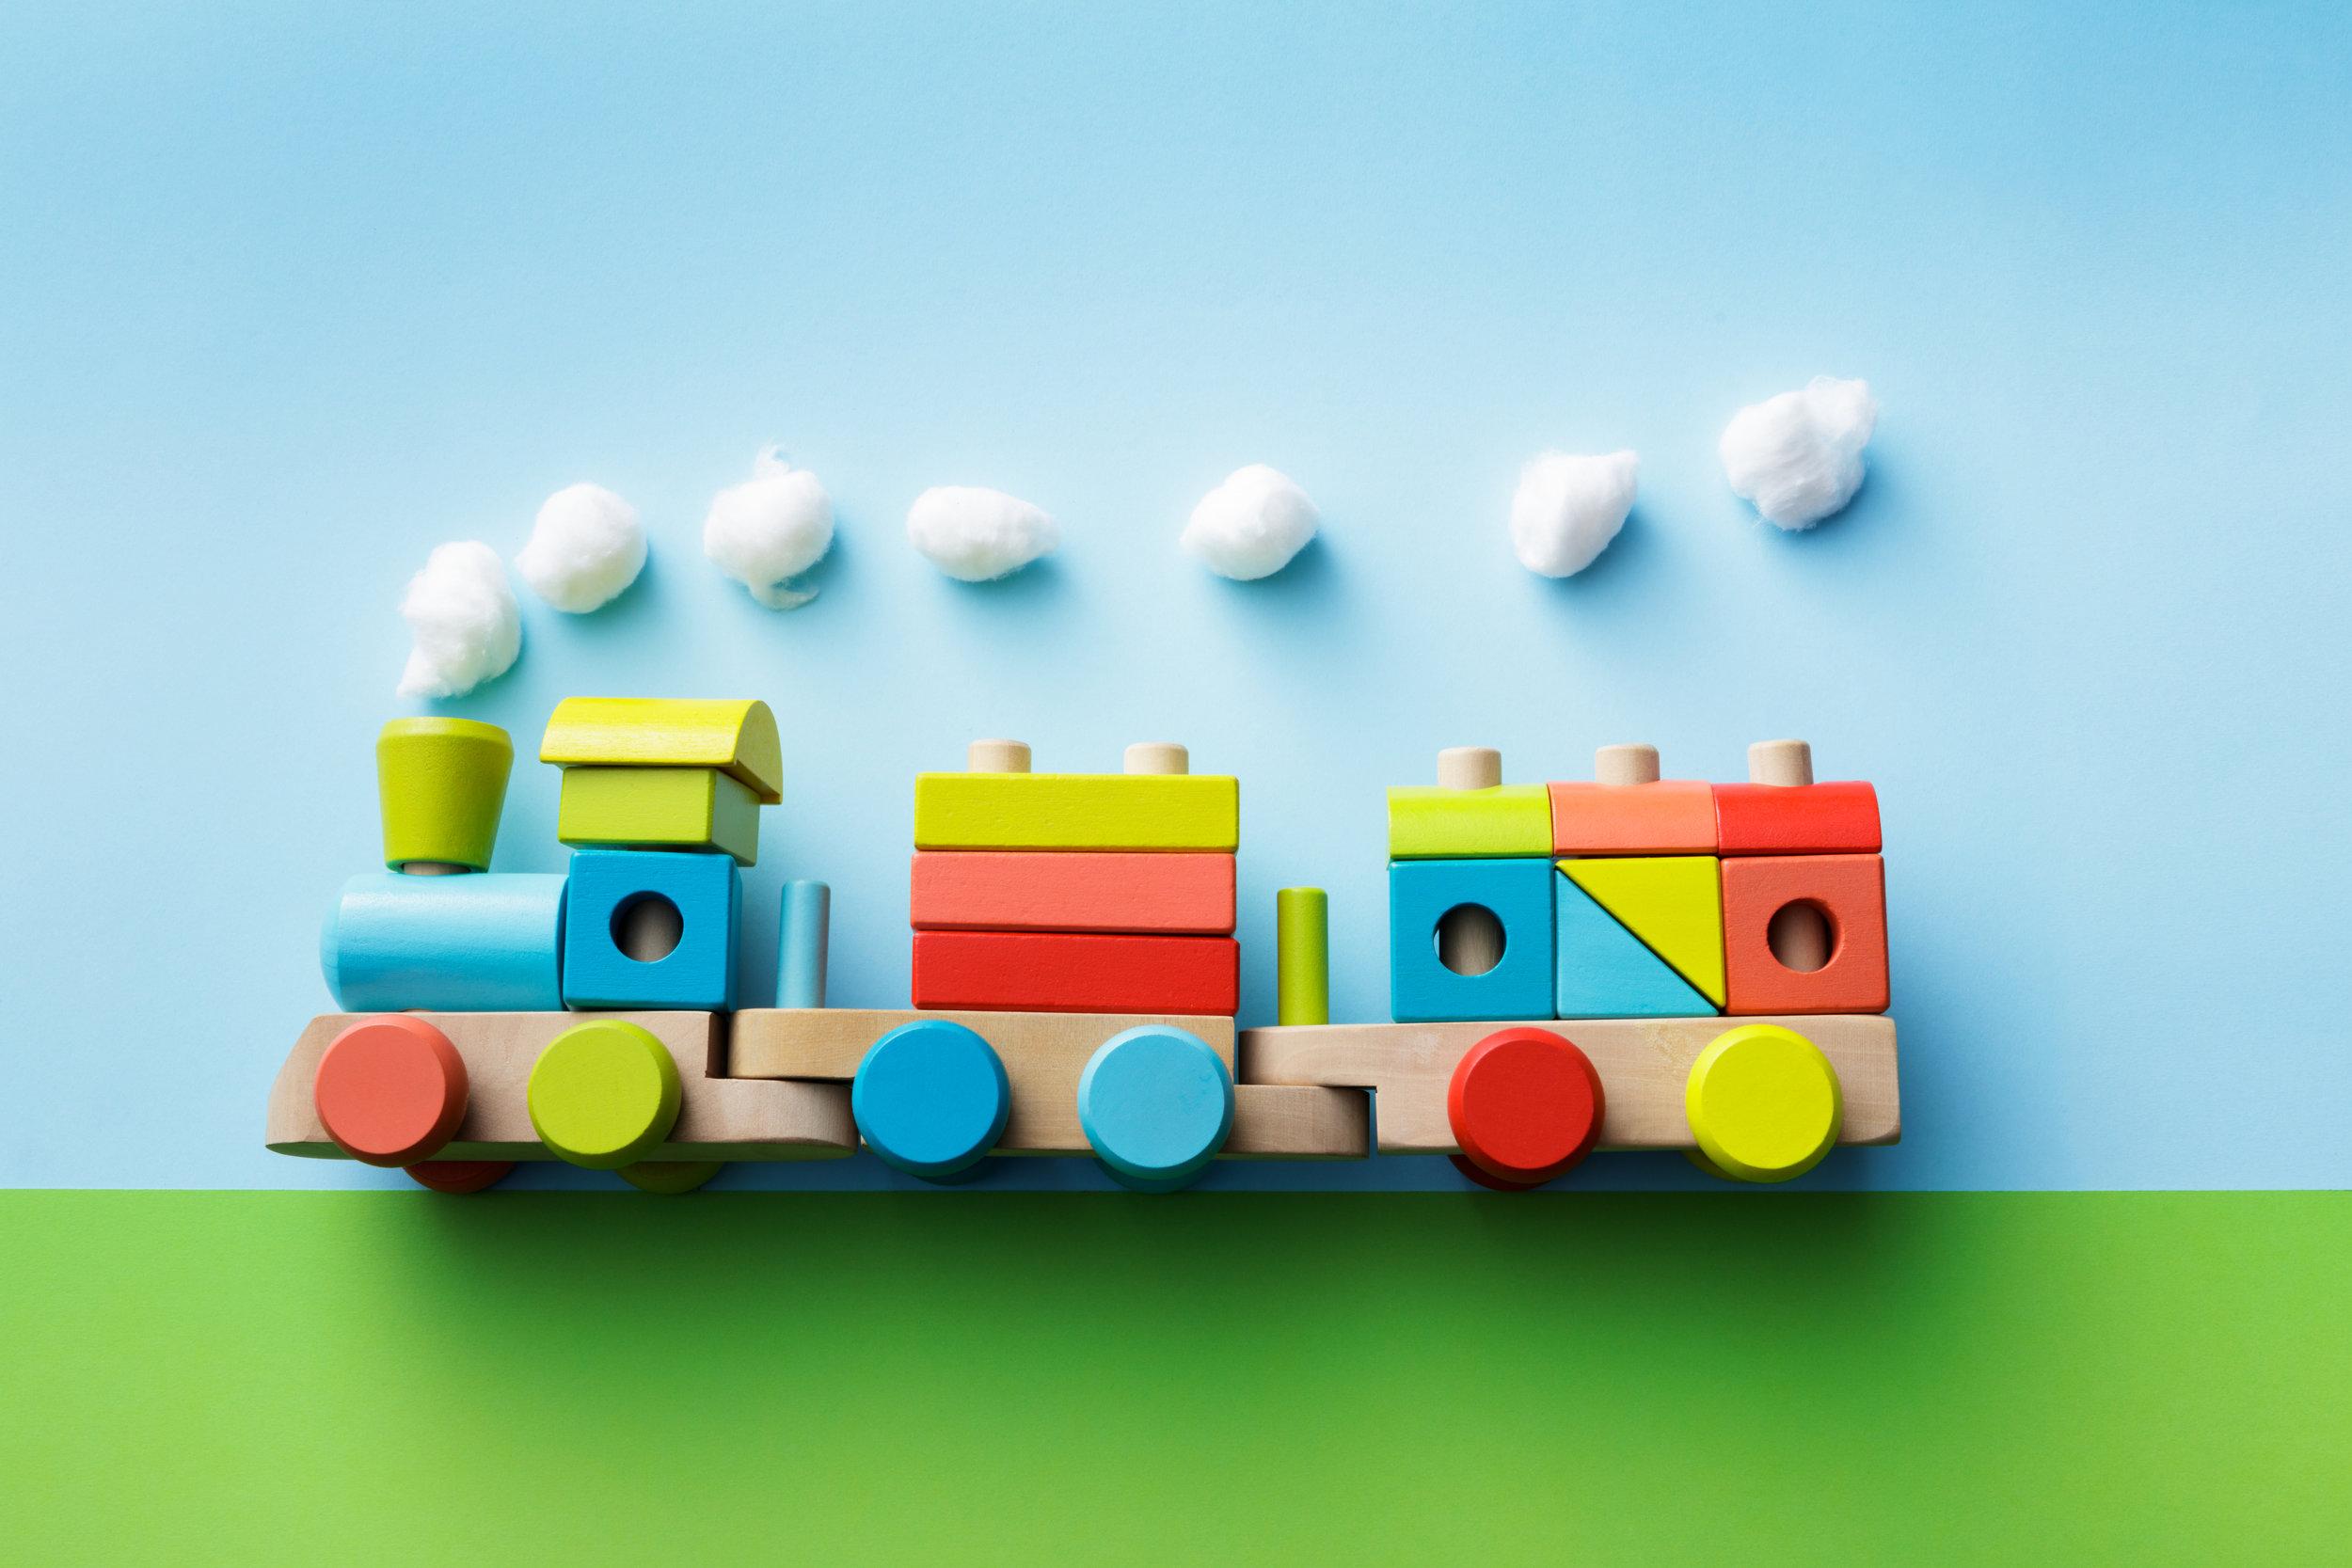 Toys_-Wooden-Train-Still-Life-931657480_8660x5773.jpeg